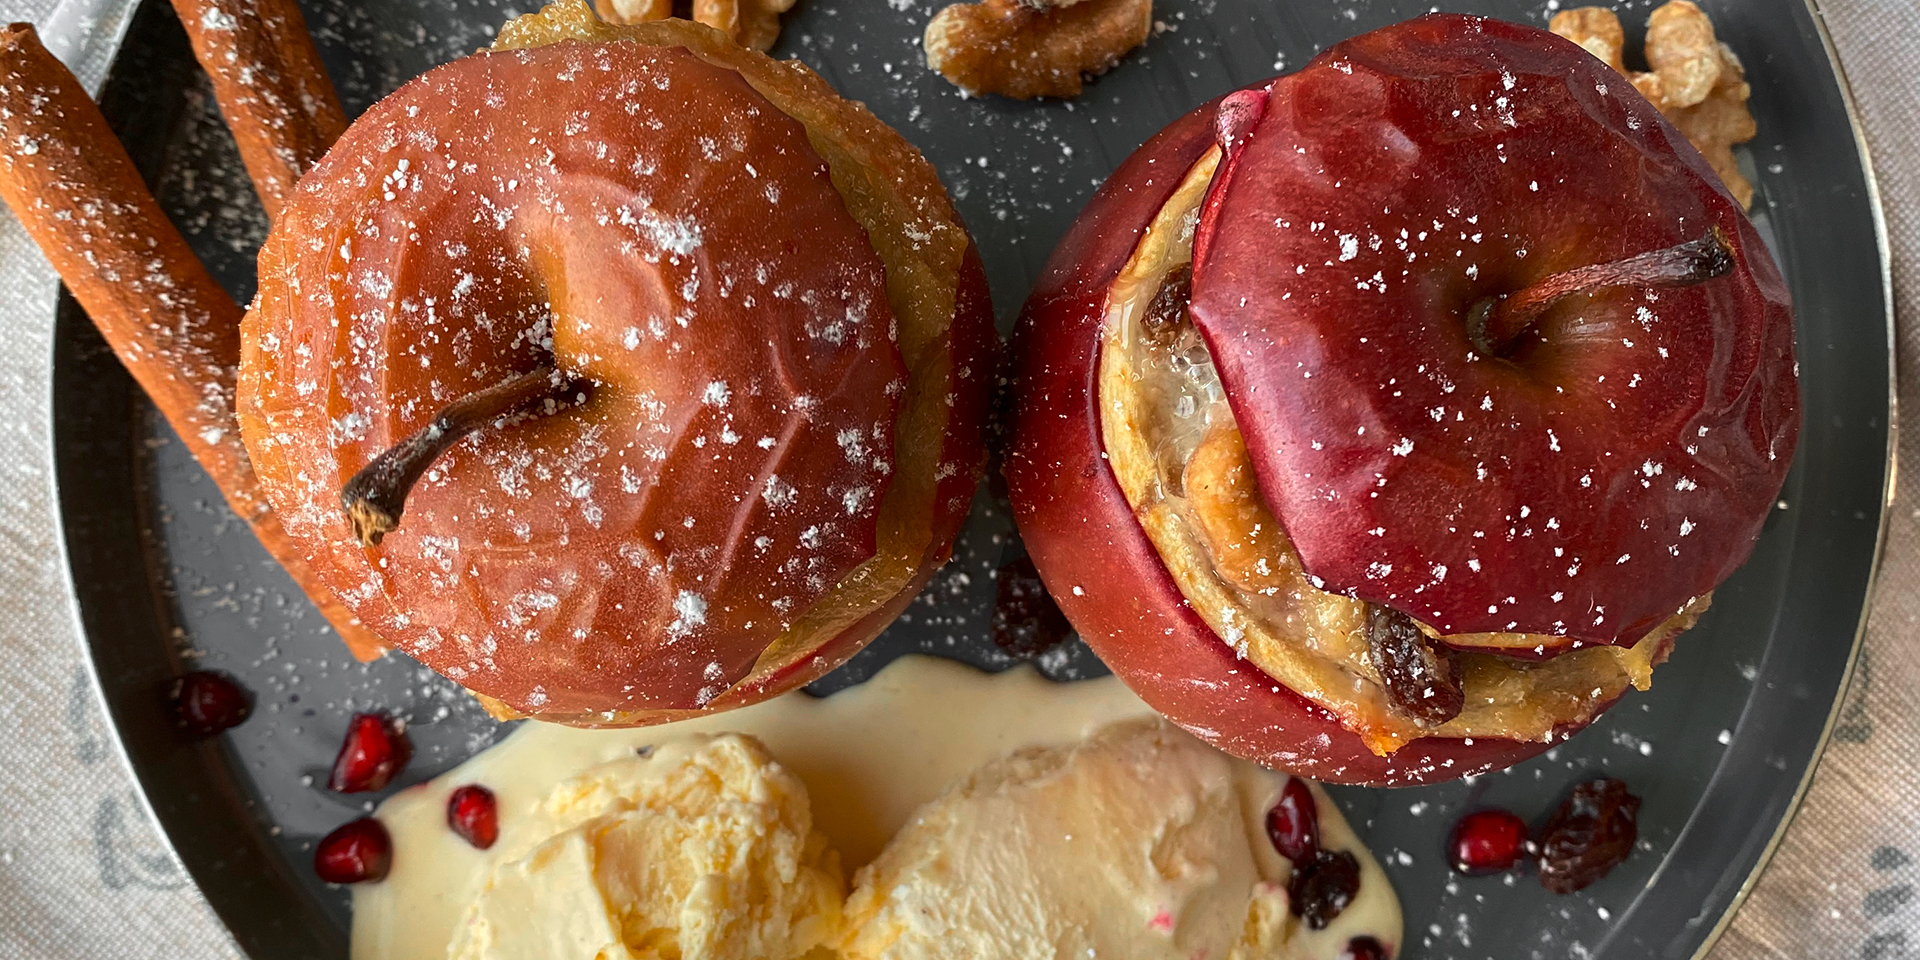 Julias Rezept: Bratapfel mit Vanilleeis